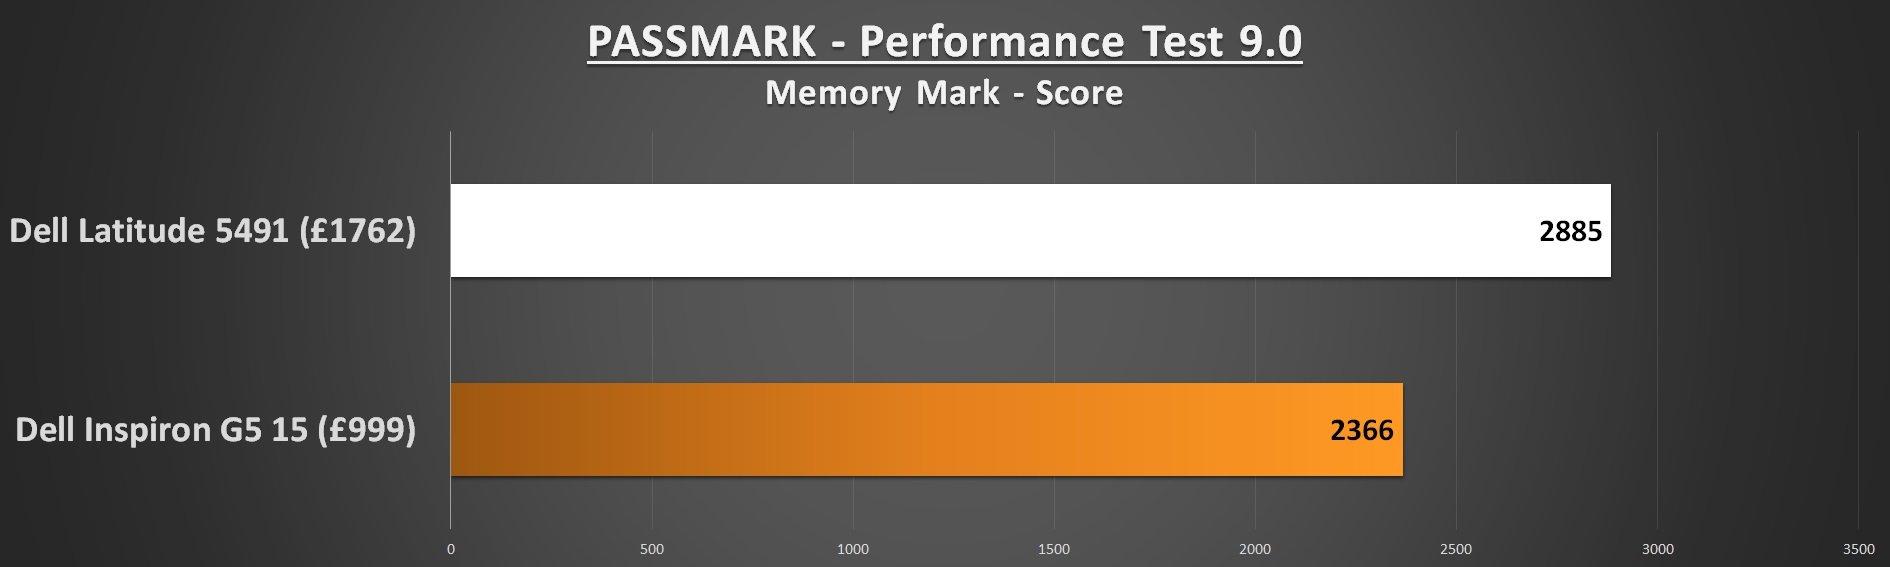 Dell Lattitude 5491 PASSMARK Memory Mark